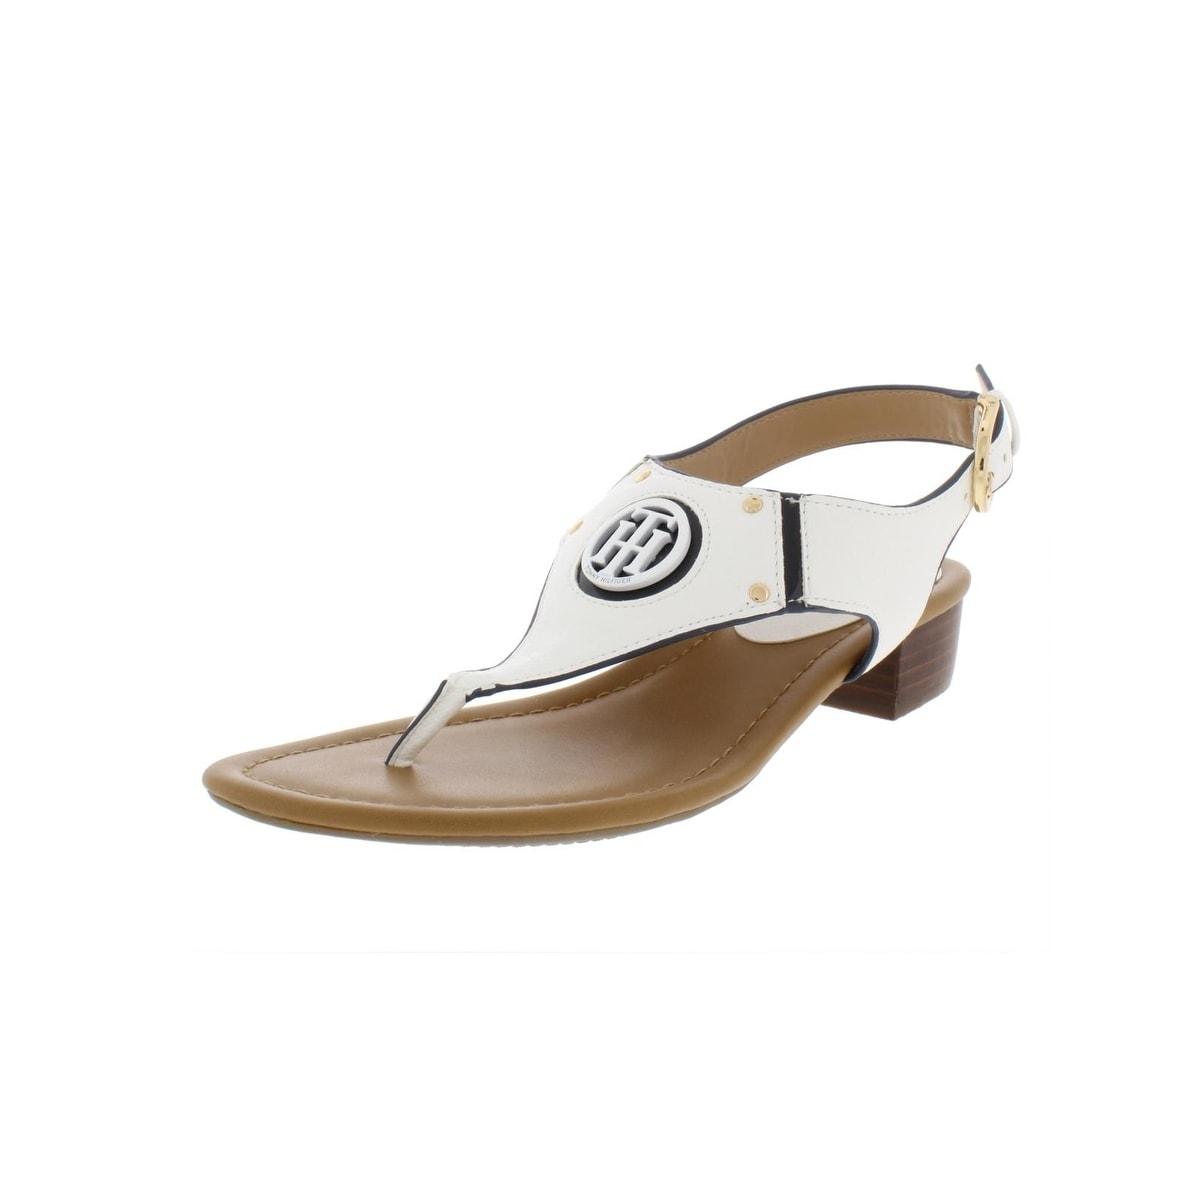 0aa3efcb92 Buy Tommy Hilfiger Women's Sandals Online at Overstock | Our Best Women's  Shoes Deals